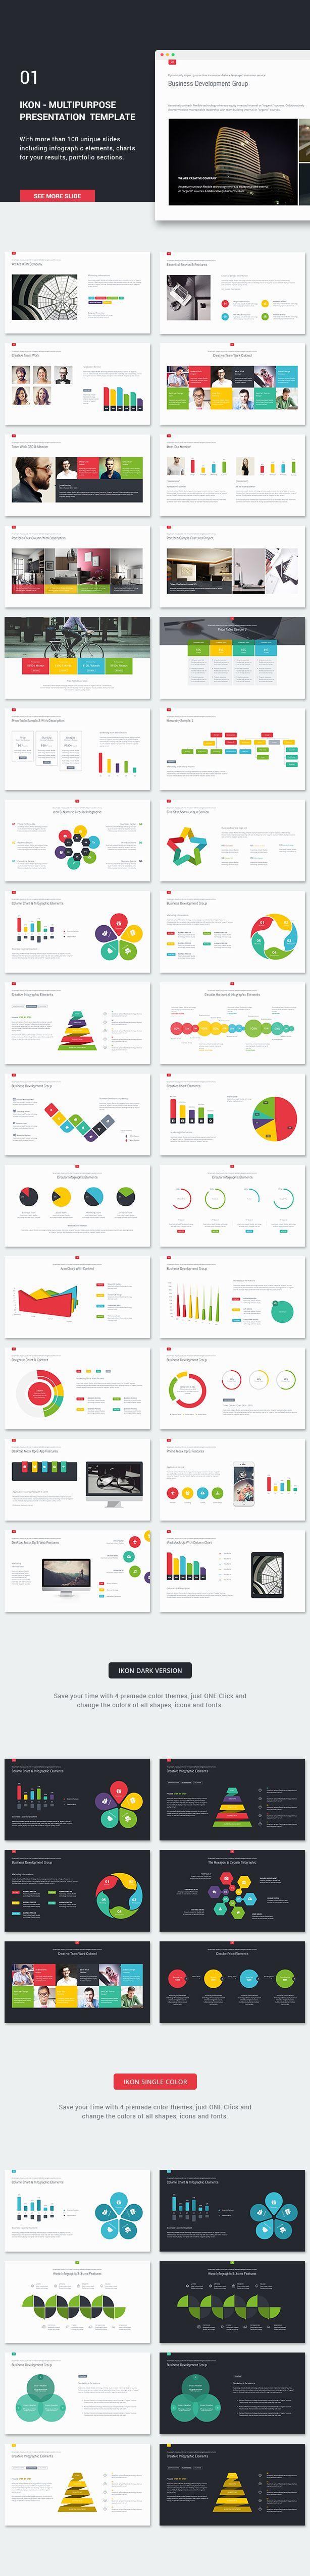 Smart Bundle 3 in 1 PowerPoint Template #design Download: http://graphicriver.net/item/smart-bundle-3-in-1-v4/12032794?ref=ksioks